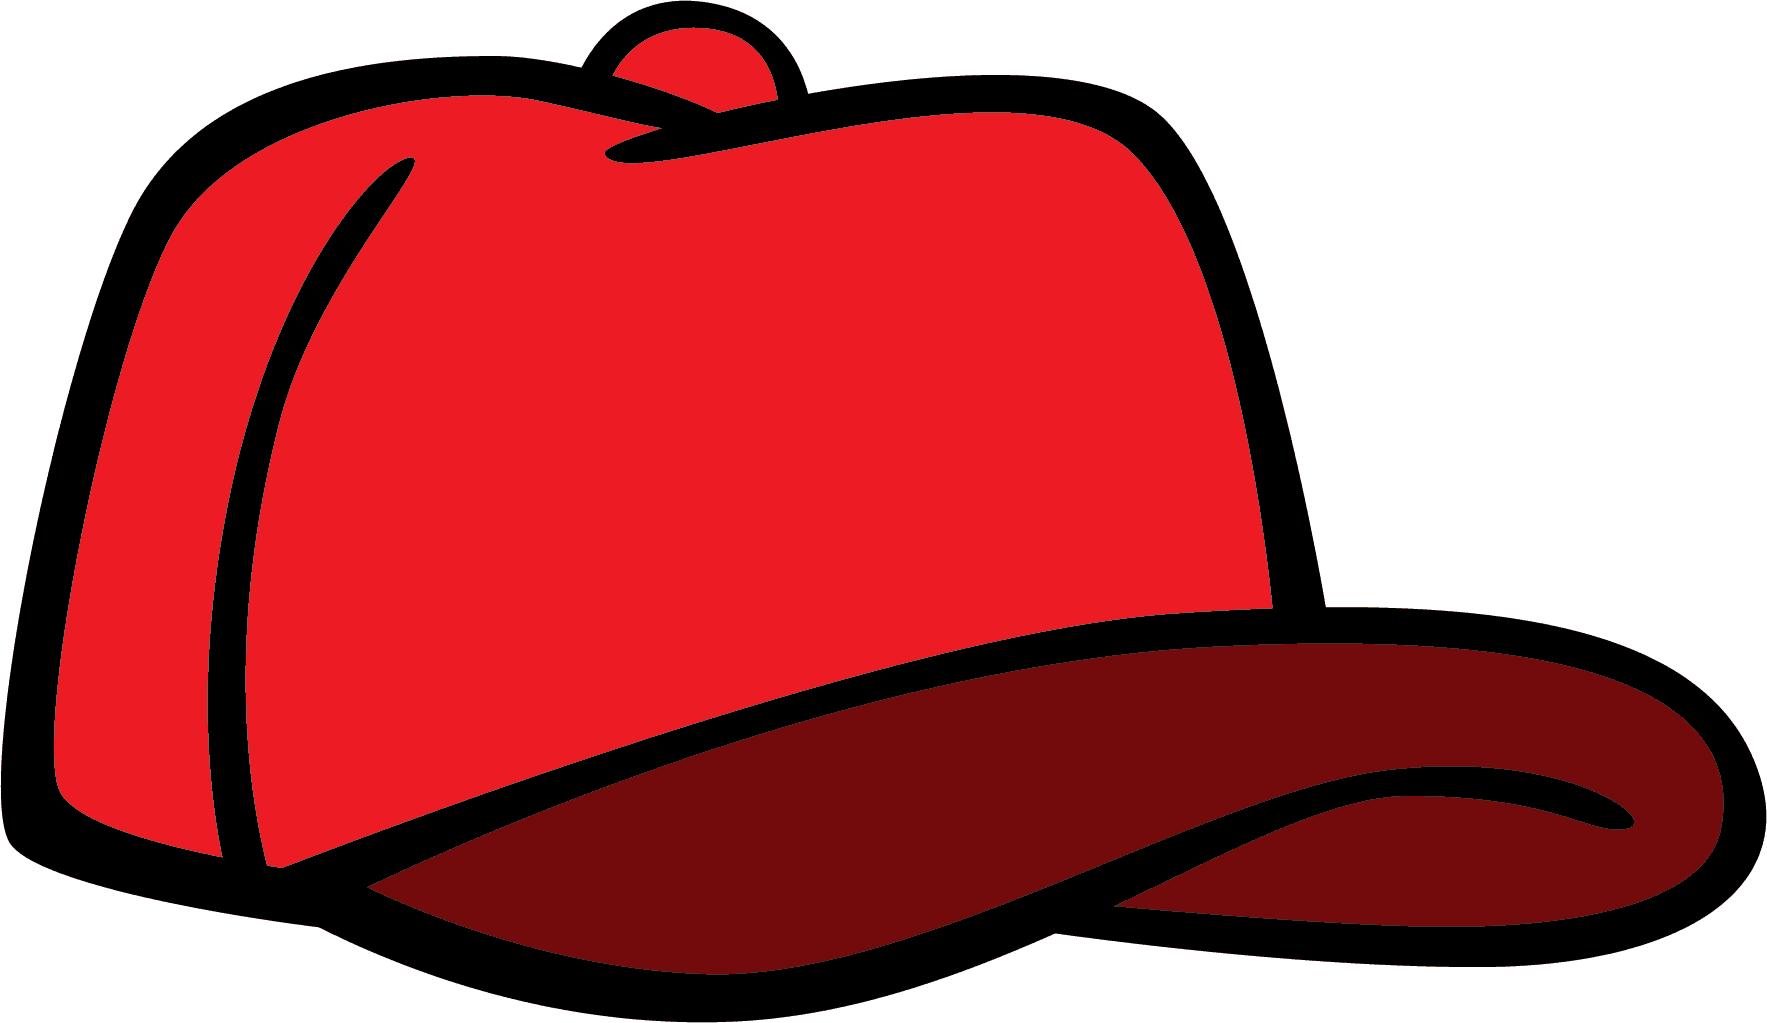 Baseball hat baseball cap clipart 4